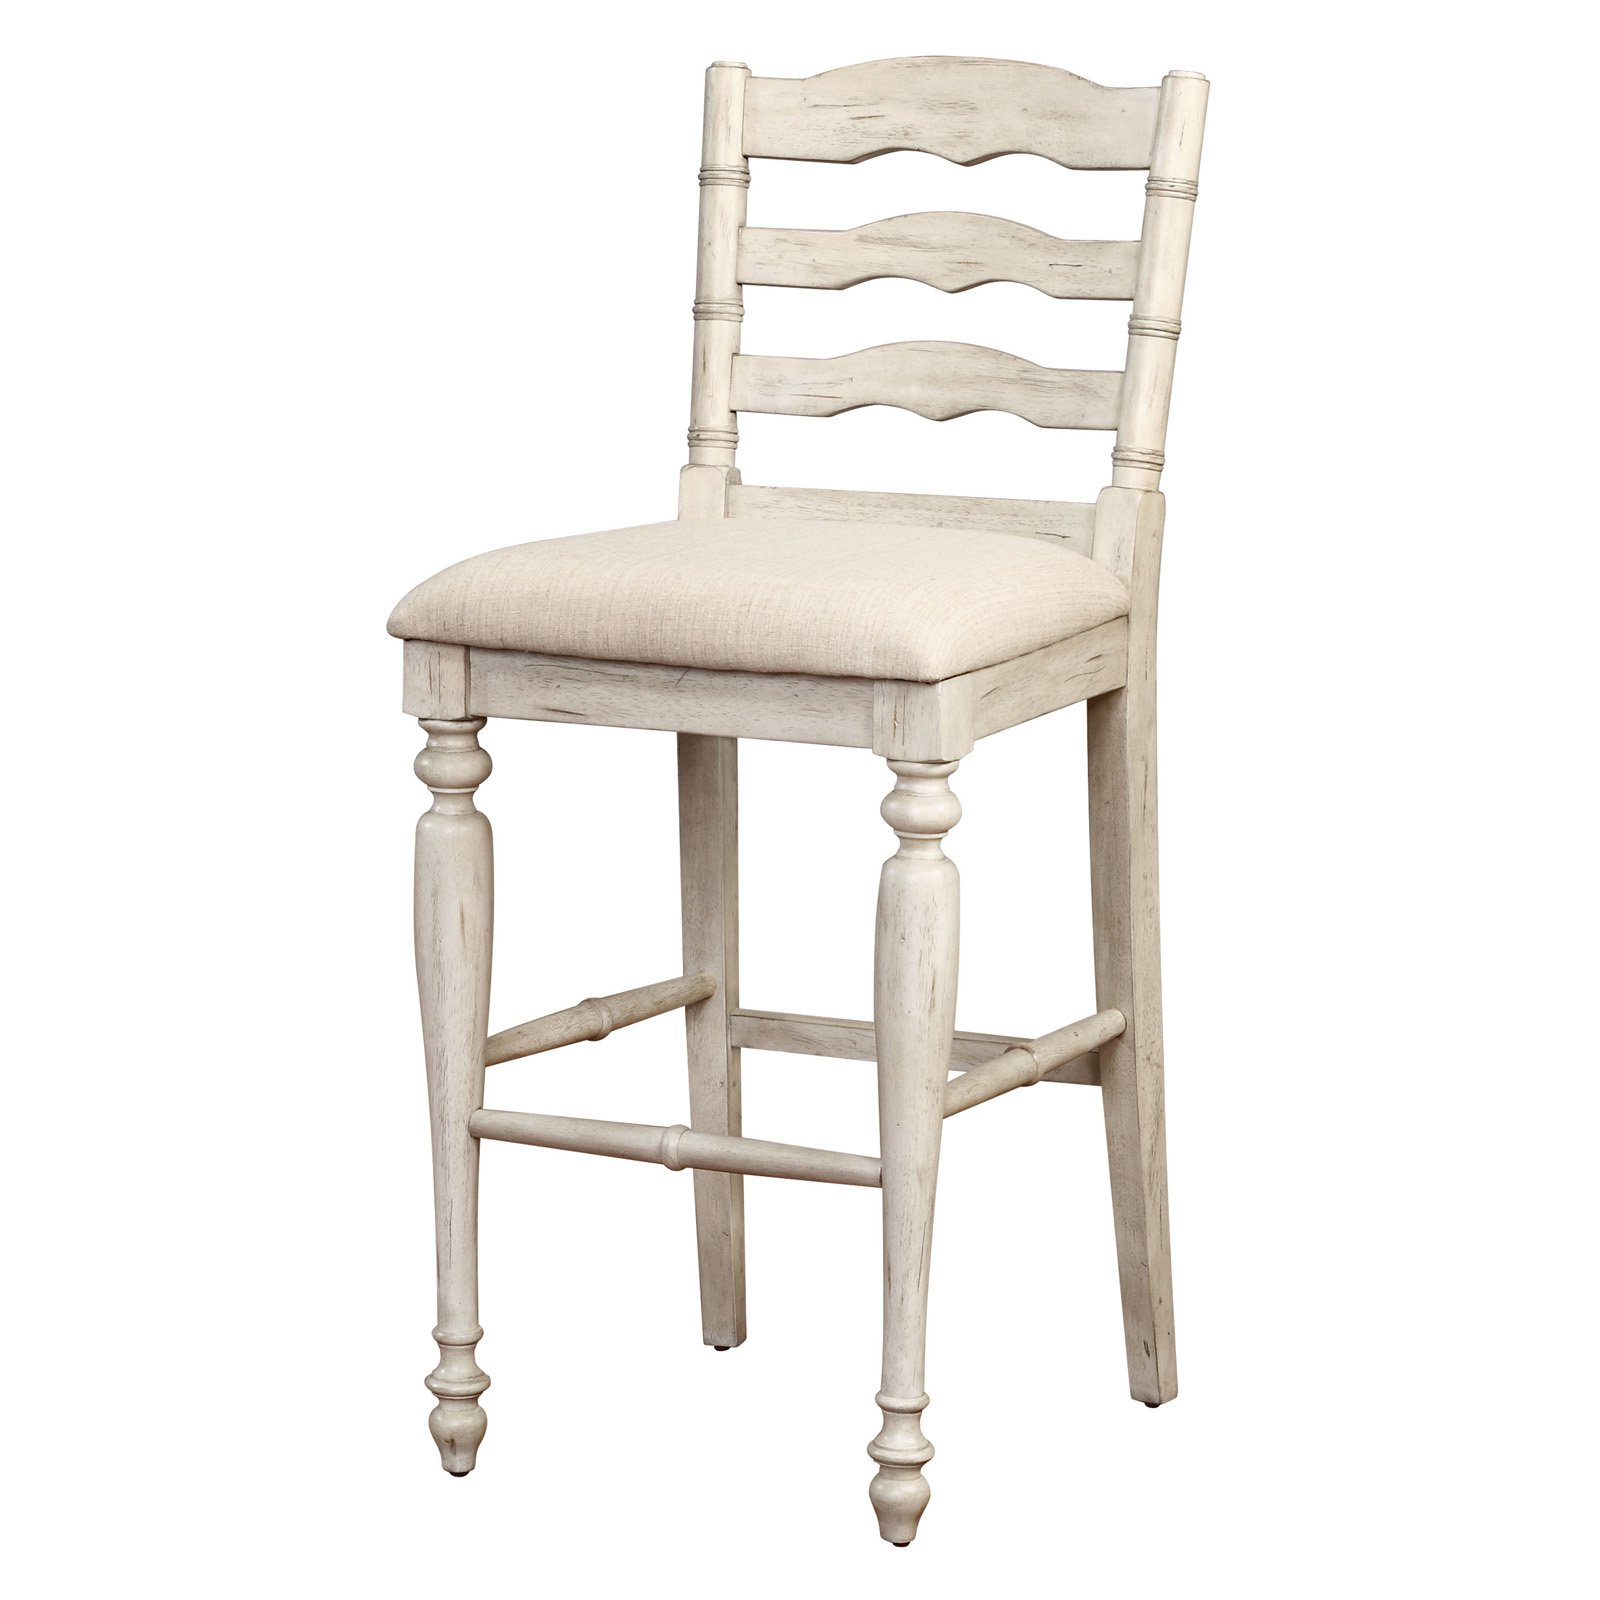 Kitchen Bar Stools Walmart: Linon Marino Bar Stool, White Wash, 30 Inch Seat Height